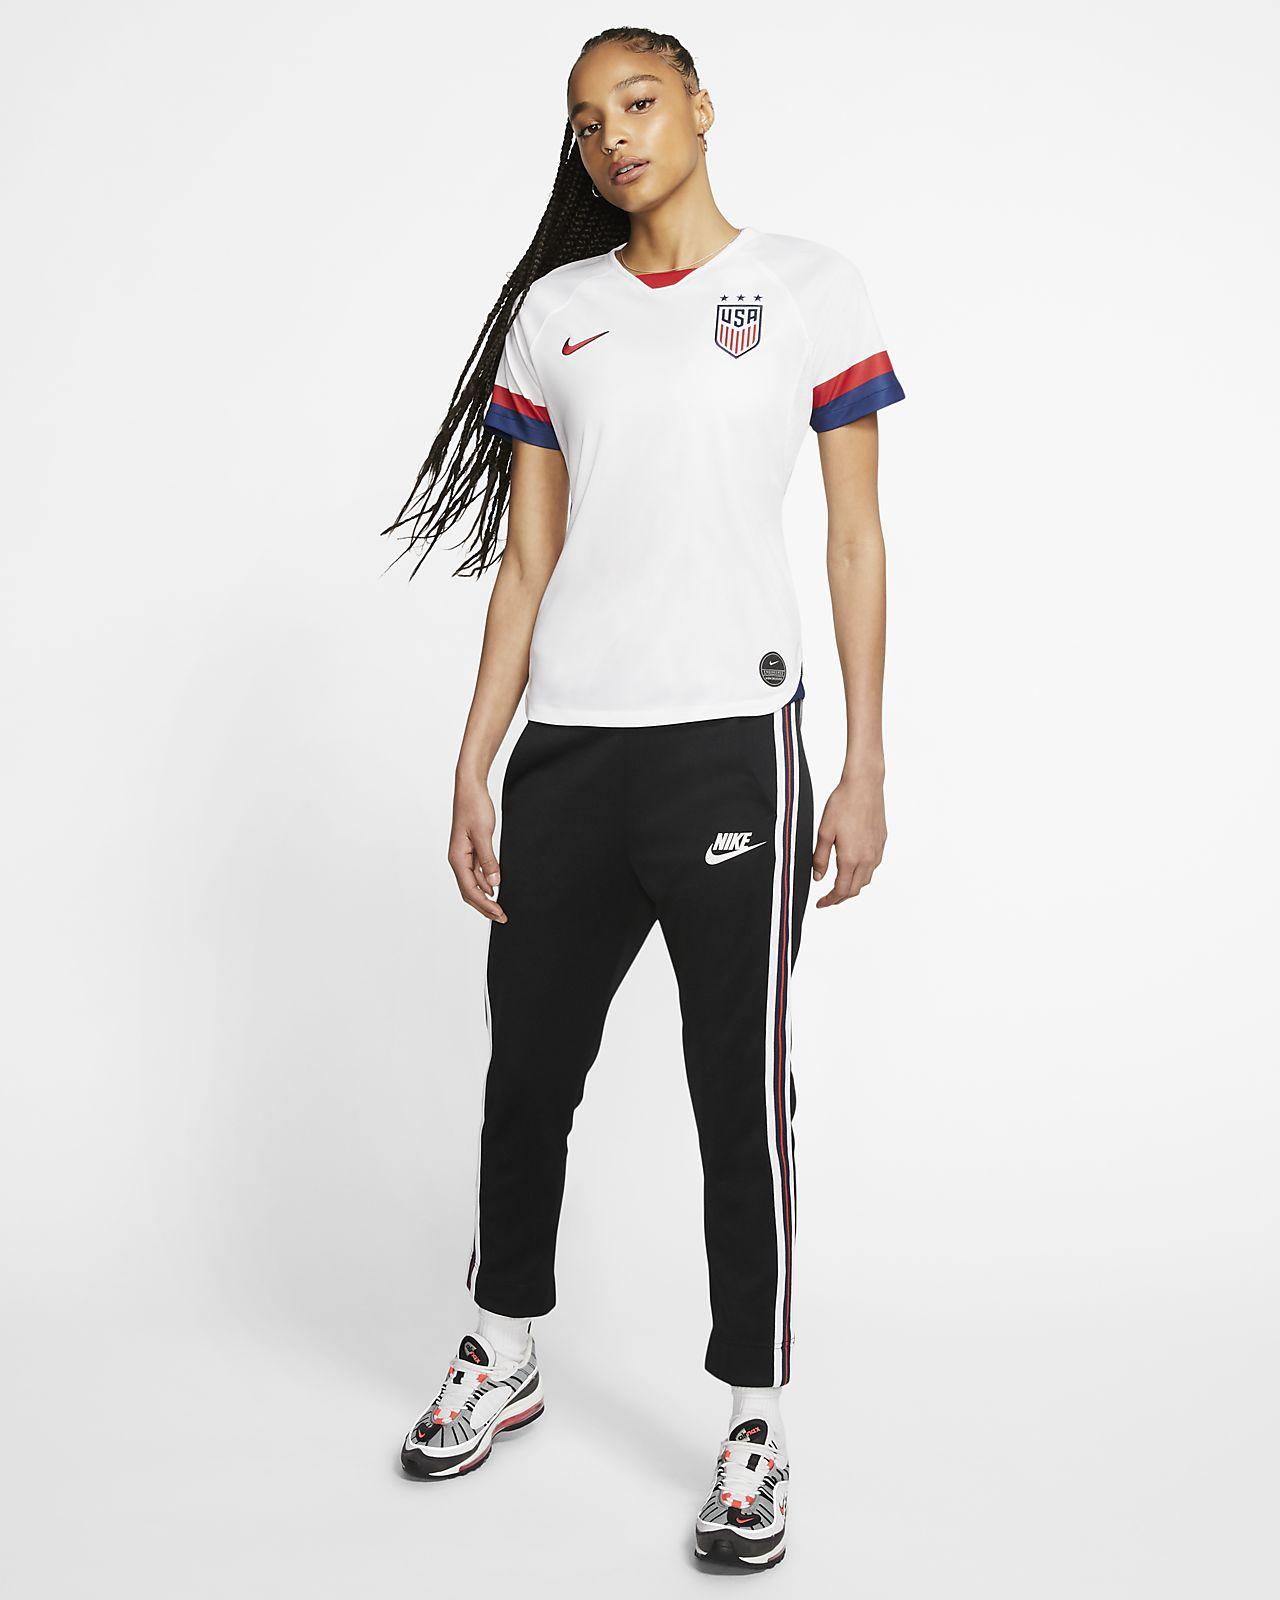 f1f17e3eac9 U.S. 2019 Stadium Home Women's Soccer Jersey. Nike.com